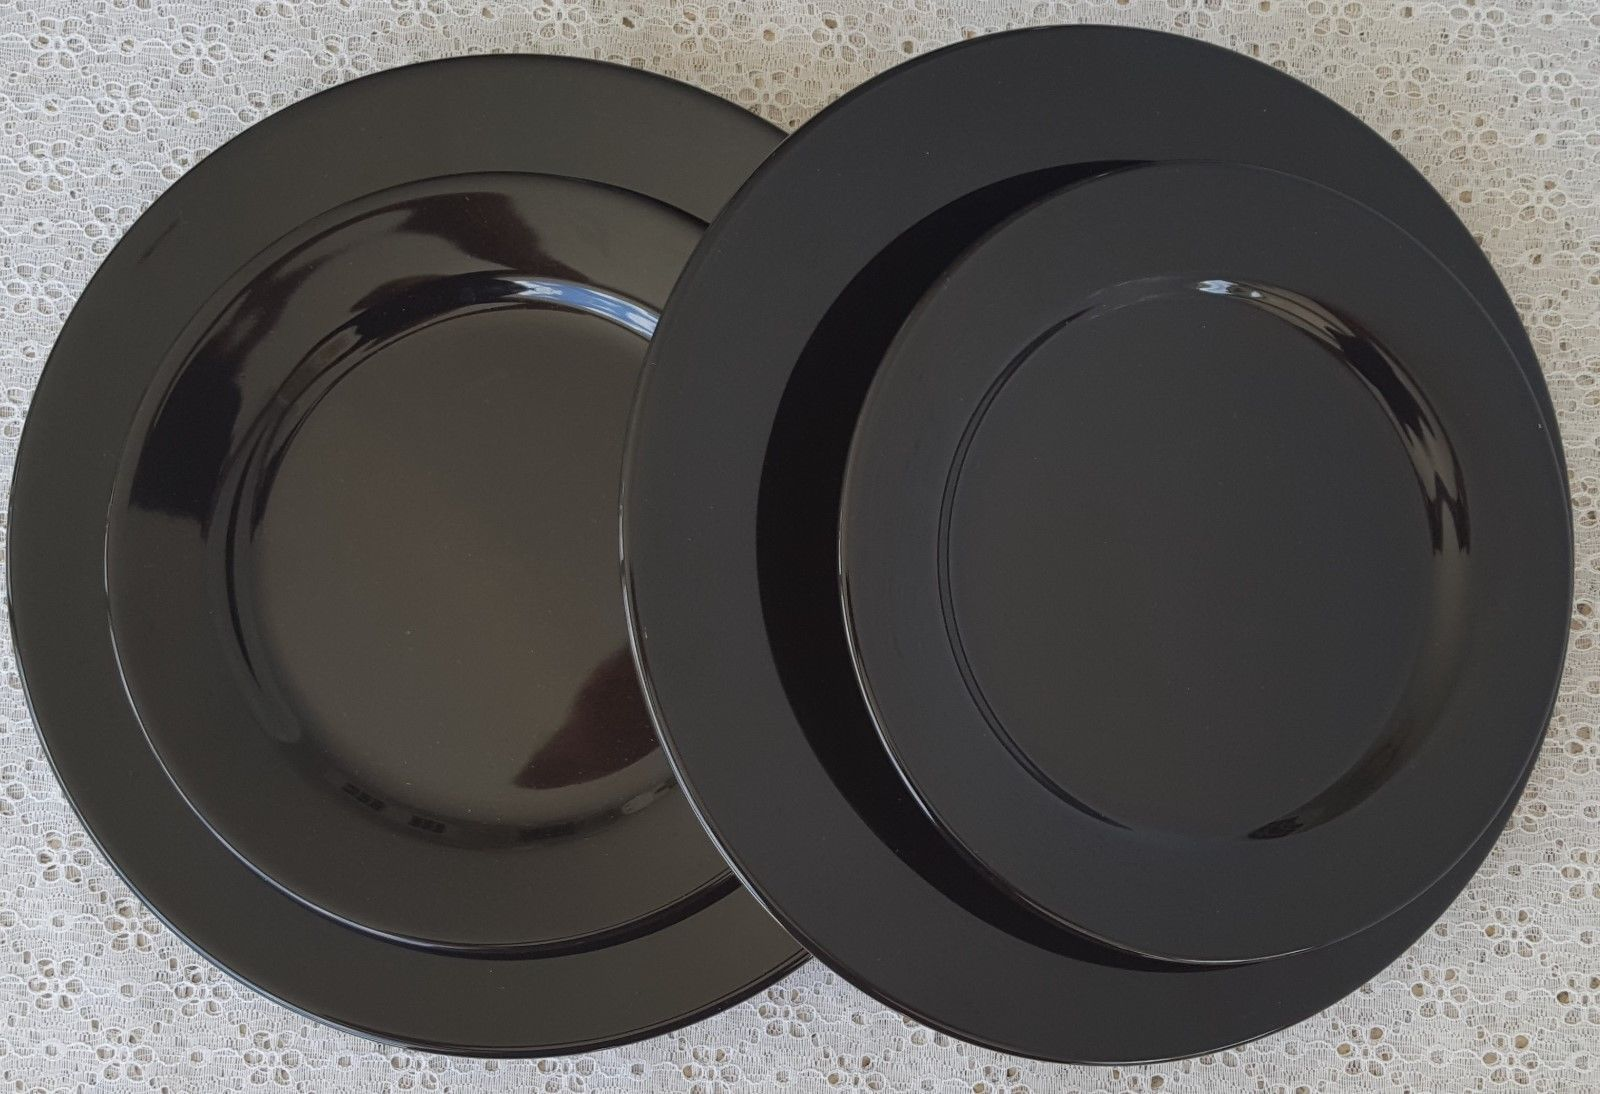 4 Pcs Waechtersbach Black Made in Spain DInner \u0026 Salad Plates Dinnerware 2 Each & 4 Pcs Waechtersbach Black Made in Spain and 50 similar items